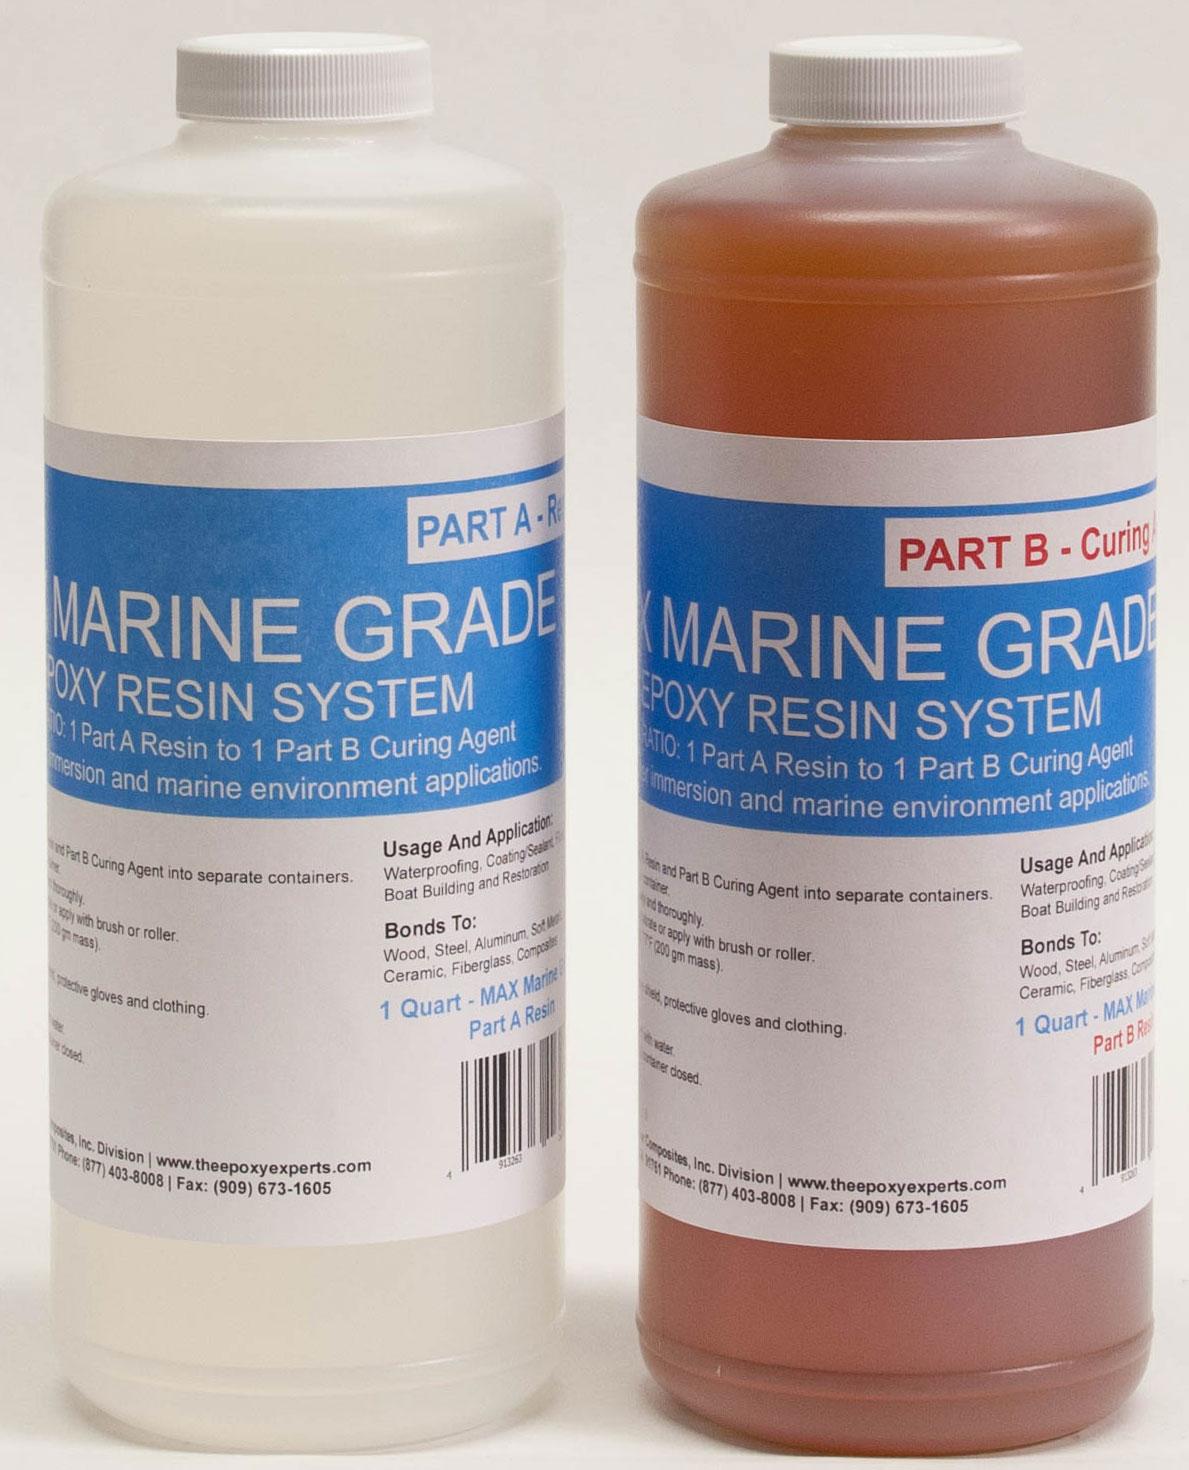 MAX MARINE GRADE Epoxy Resin System - 1/2 Gallon Kit - Wood Sealing, High  Strength Fiberglassing Marine Applications, Composite Fabricating Resin -